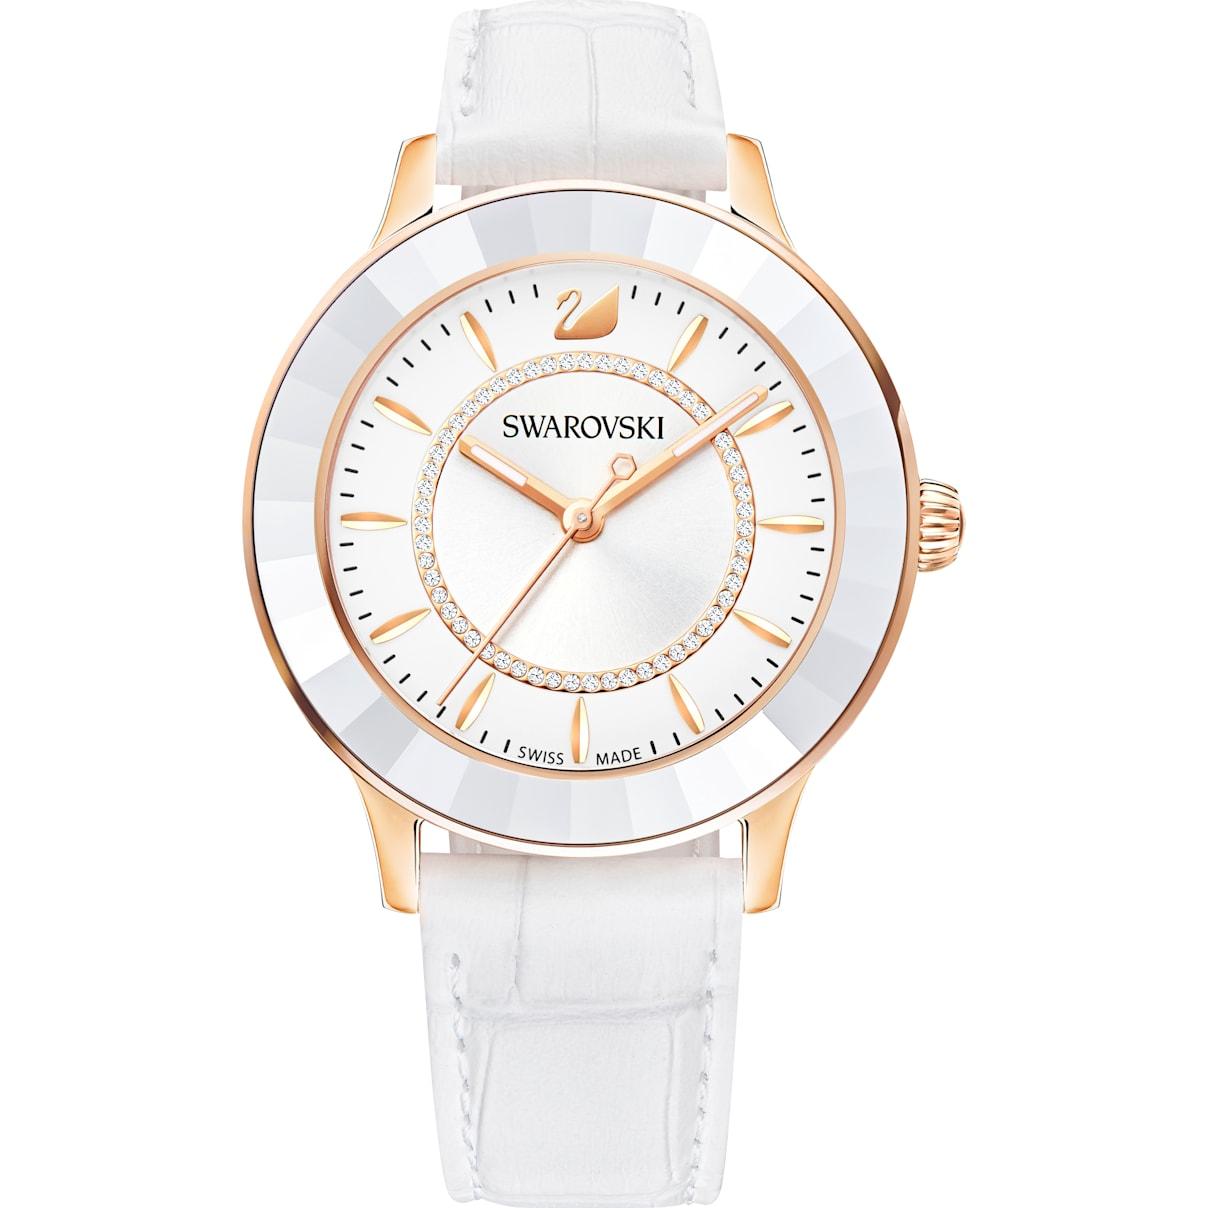 Swarovski Octea Lux Watch, Leather strap, White, Rose-gold tone PVD